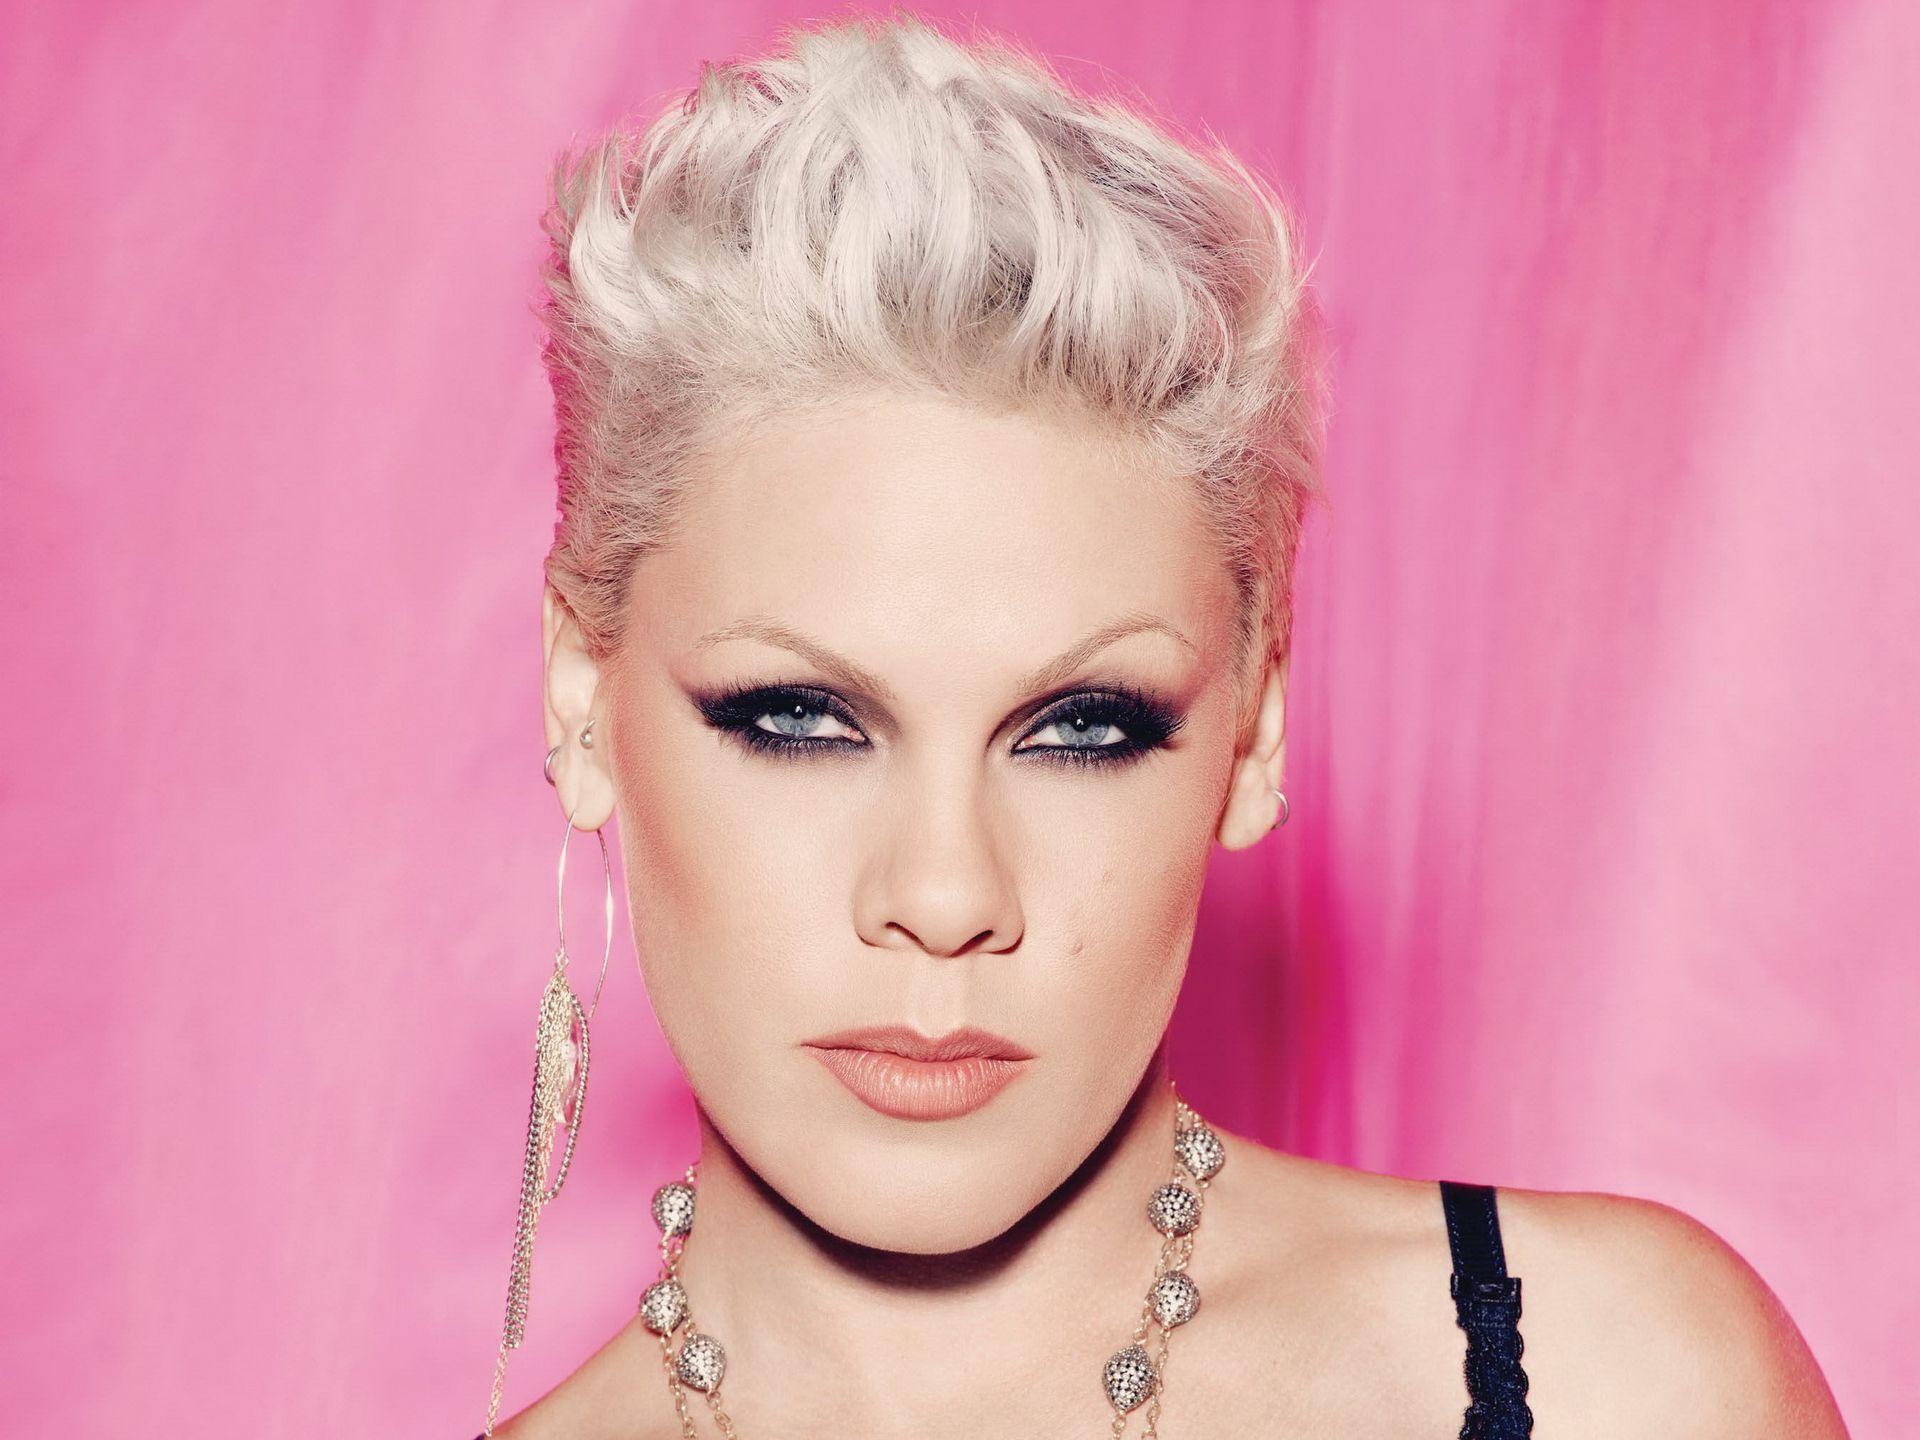 top 10 feminine very short hairstyles for women | p!nk